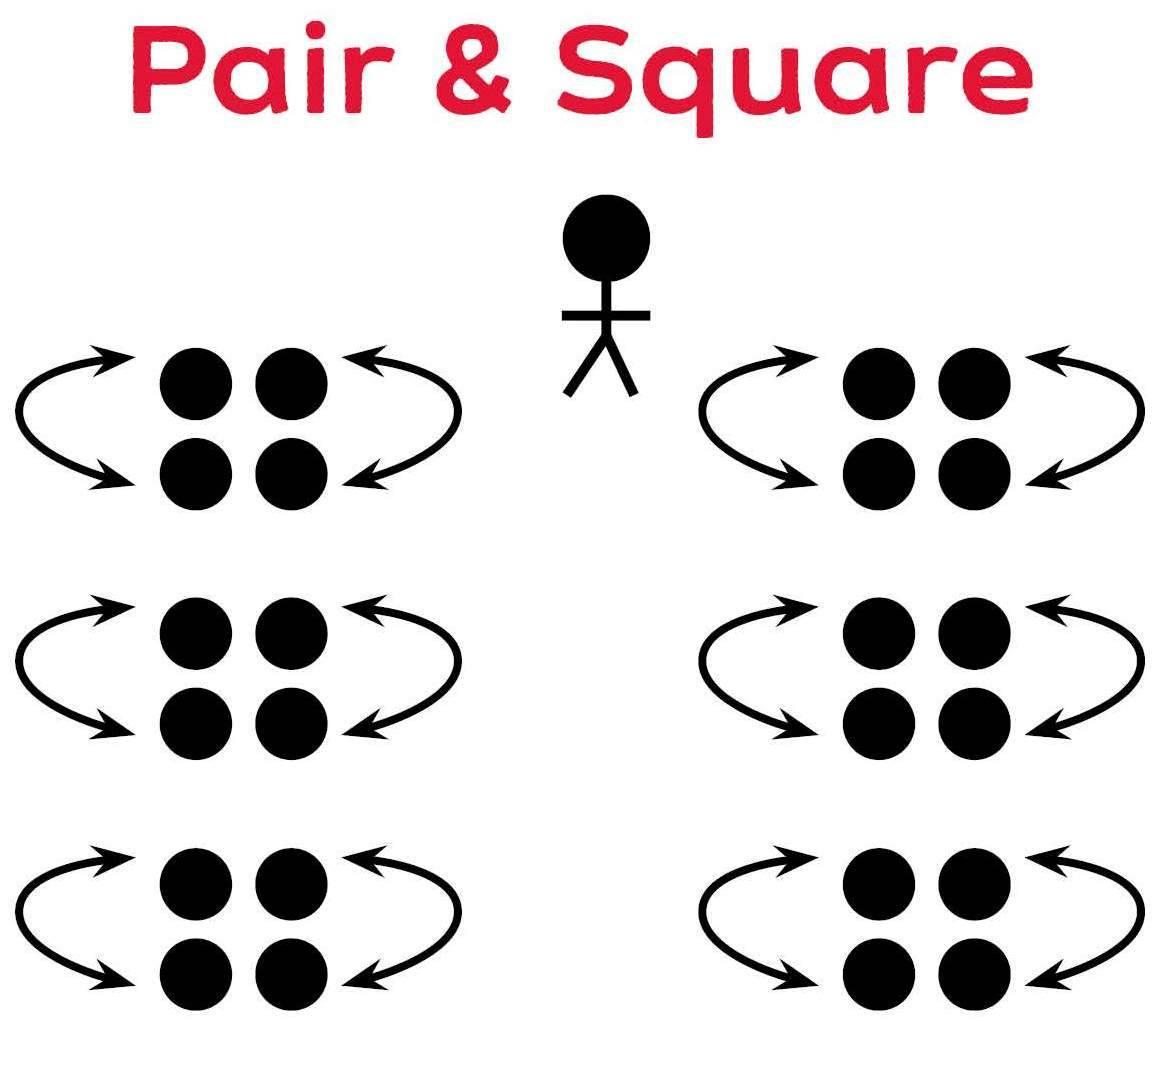 Flexible Classroom Space: Pair Square